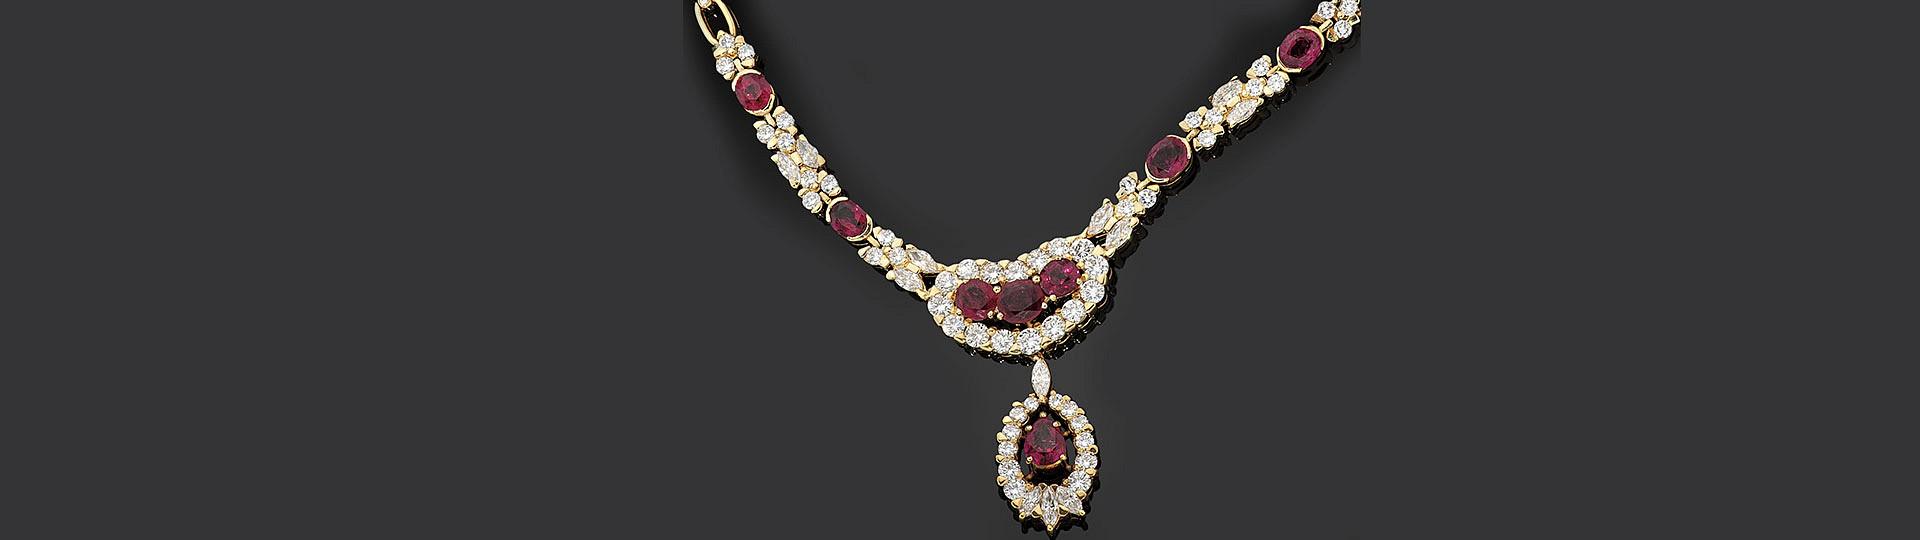 Alta Joyería, Joyería Fina y Relojes | High Jewelry, Fine Jewelry and Watches  by Morton Subastas